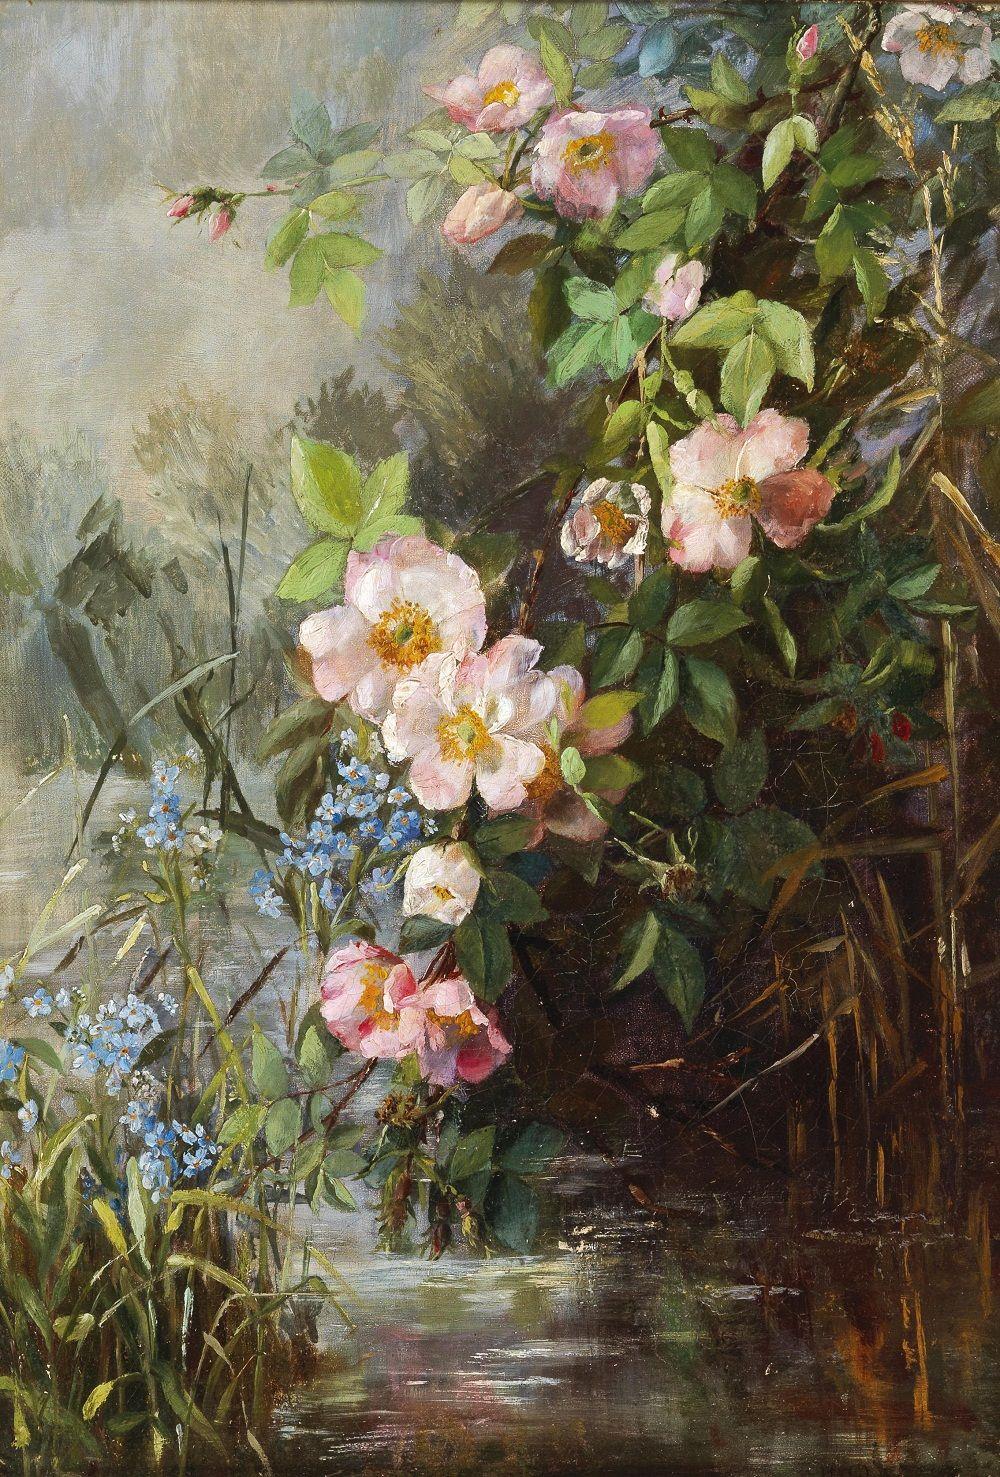 Künstler, Anfang des 20. Jahrhunderts Blumen am Teichufer